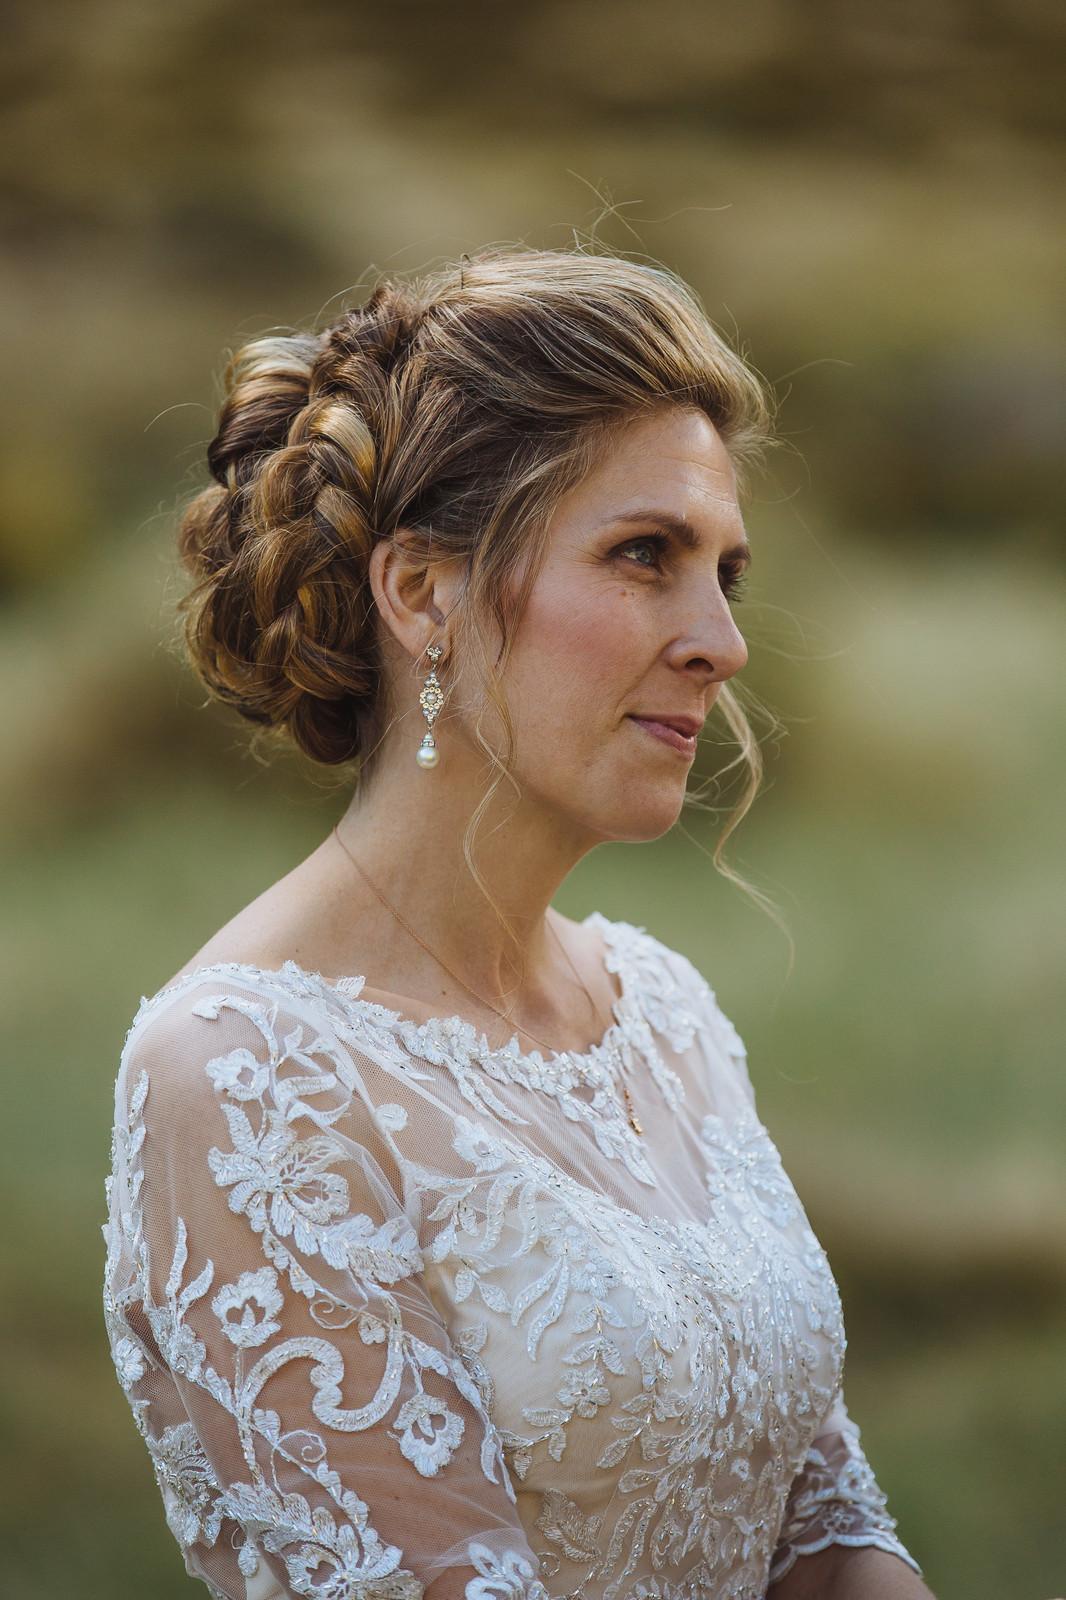 hairstyles gallery | wanaka | wanaka professional wedding hair stylist